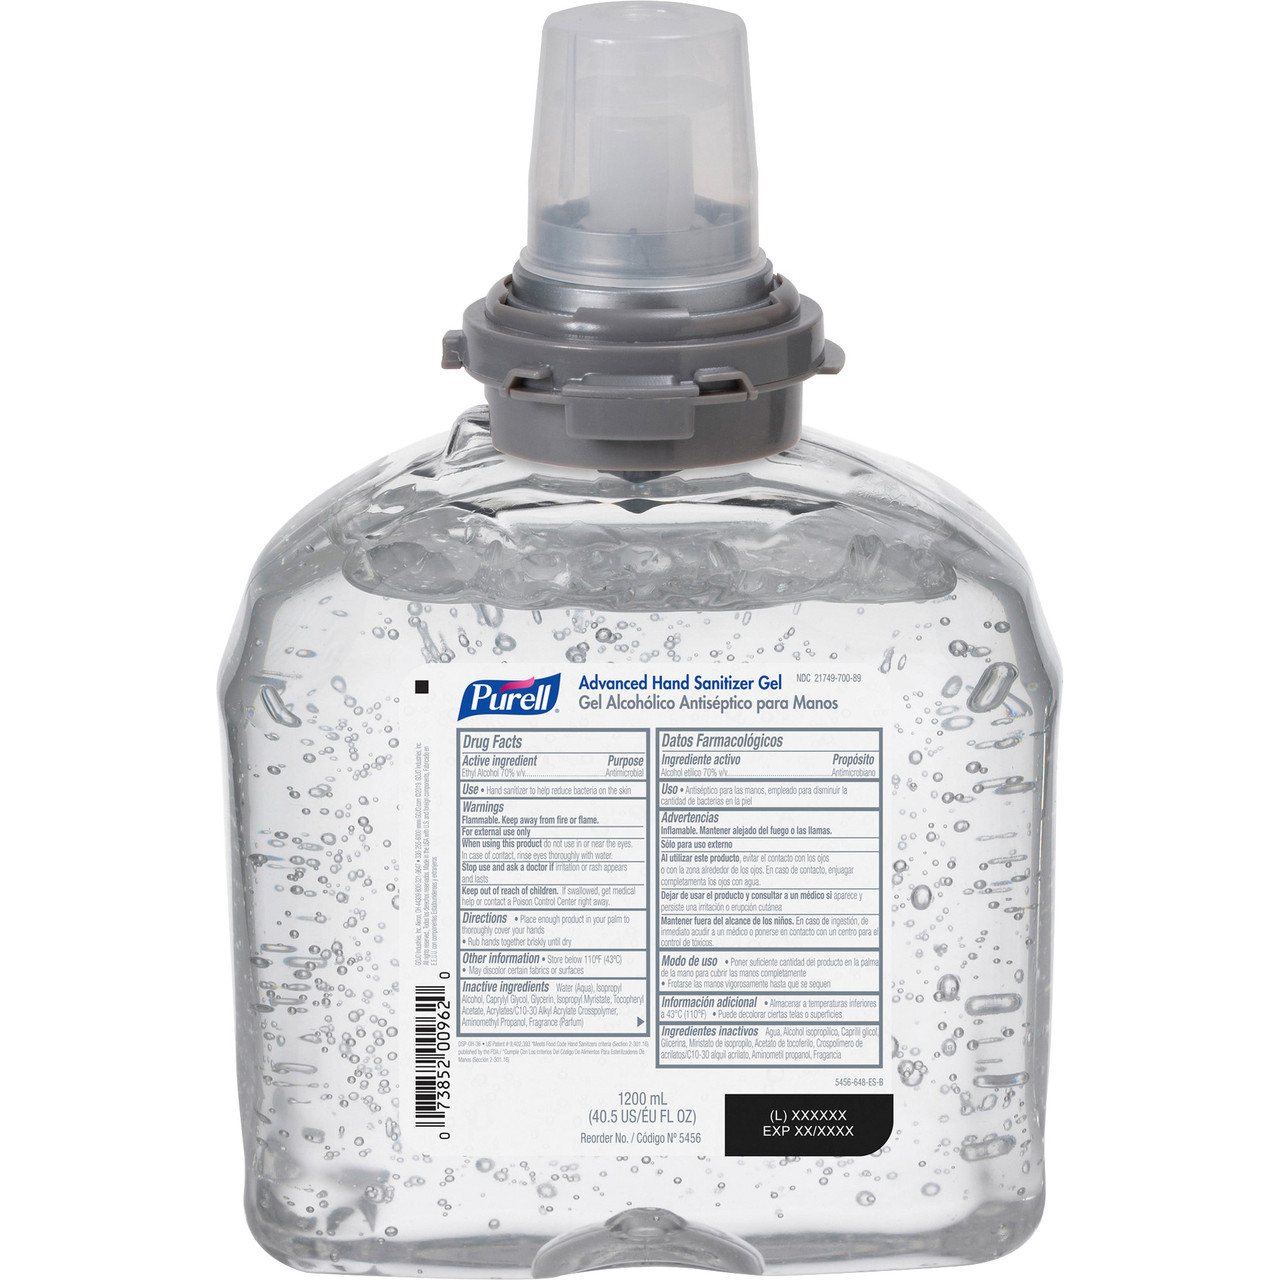 PURELL® TFX Hand Sanitizer Dispenser Refill - 40.6 fl oz (1200 mL) - Kill Germs - Hand, Skin - Clear - Moisturizing, Antimicrobial - 4 / Carton